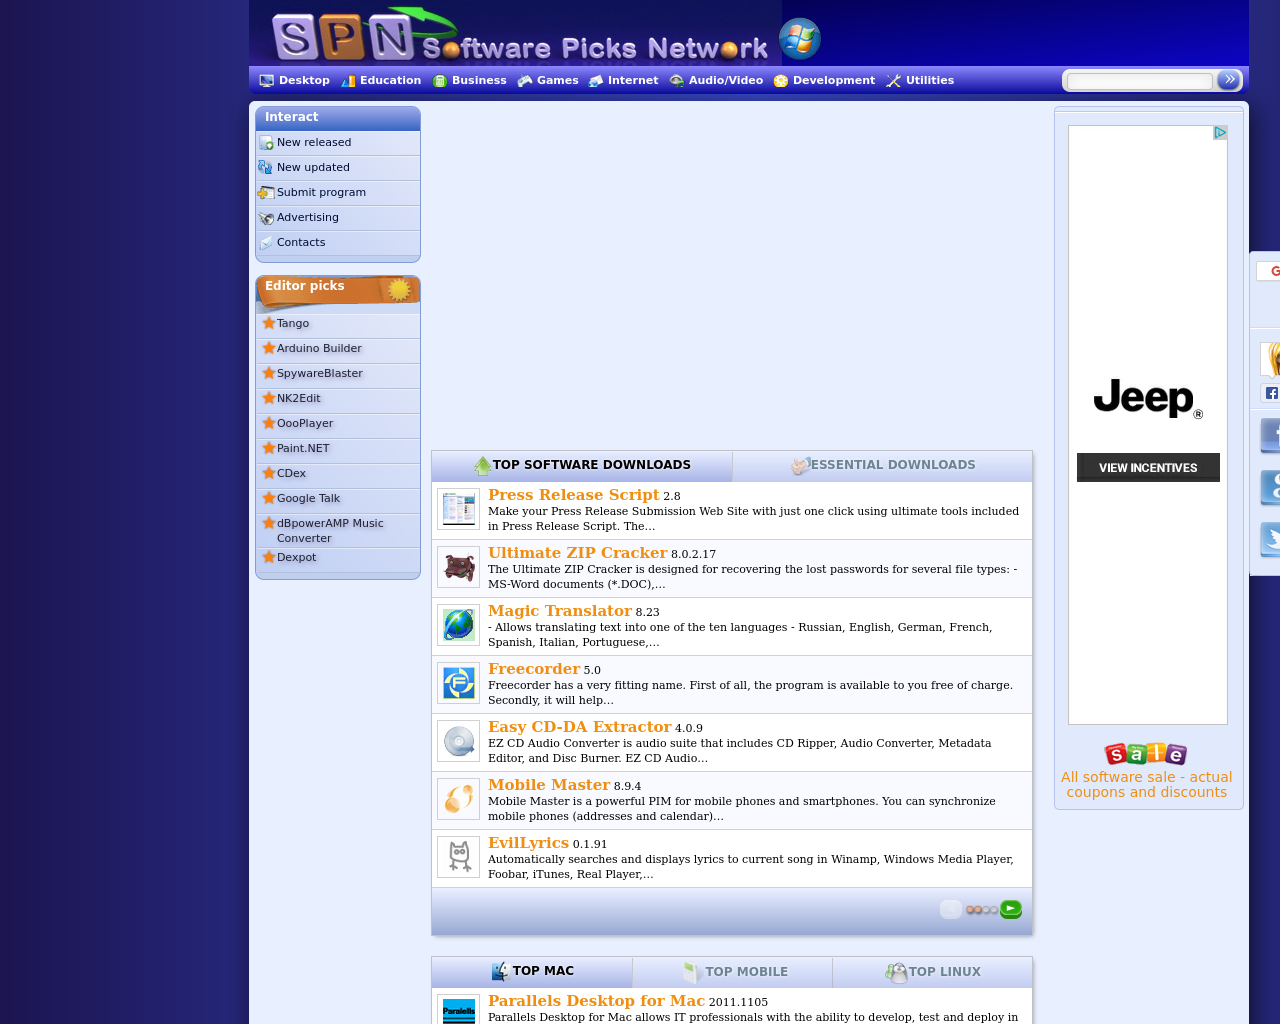 Software-Picks-Network-Advertising-Reviews-Pricing